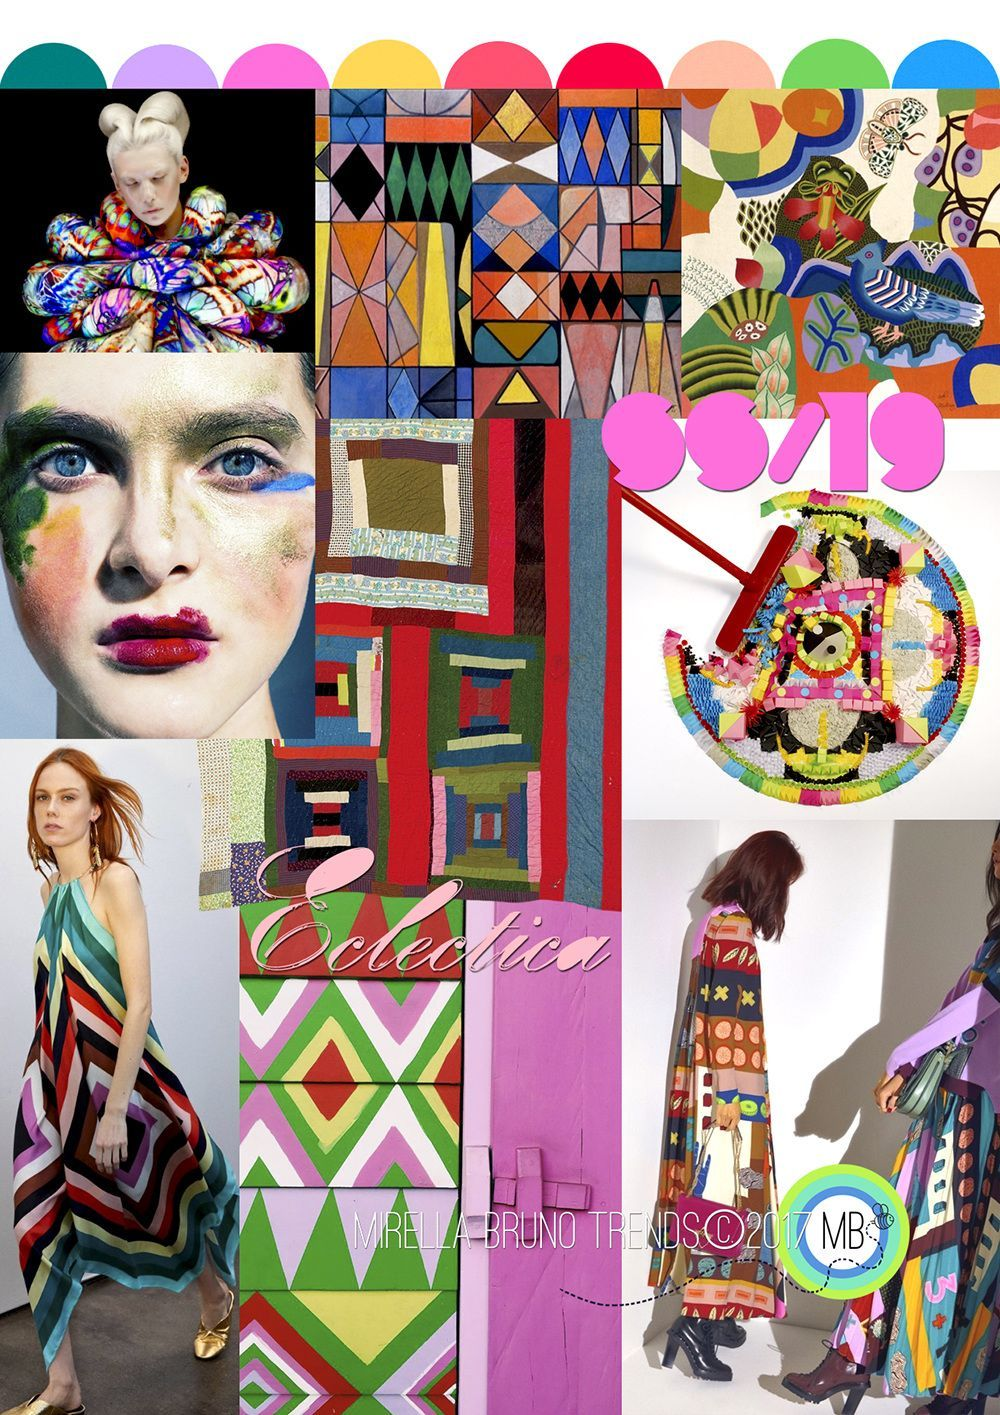 Design Print Trends: Print, Pattern, Art, Illustration, Trend, Graphics, Visual